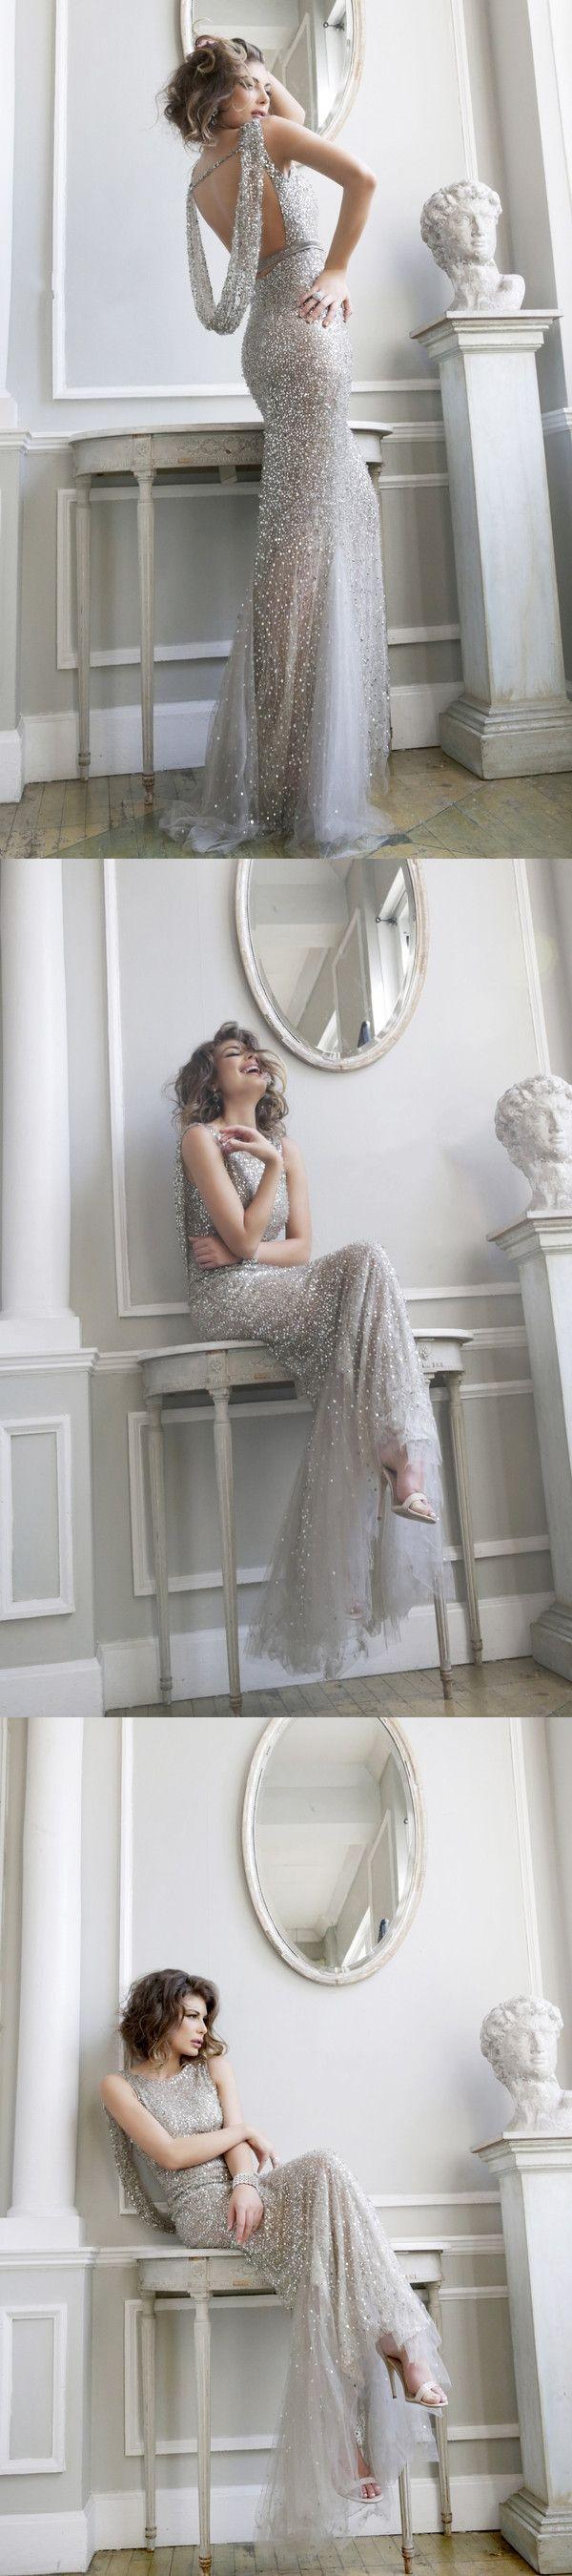 Designer Elegant Long Prom Dress,Silver Sequin Stunning Prom Gown,Modest Celebrity Dresses,Evening Dress